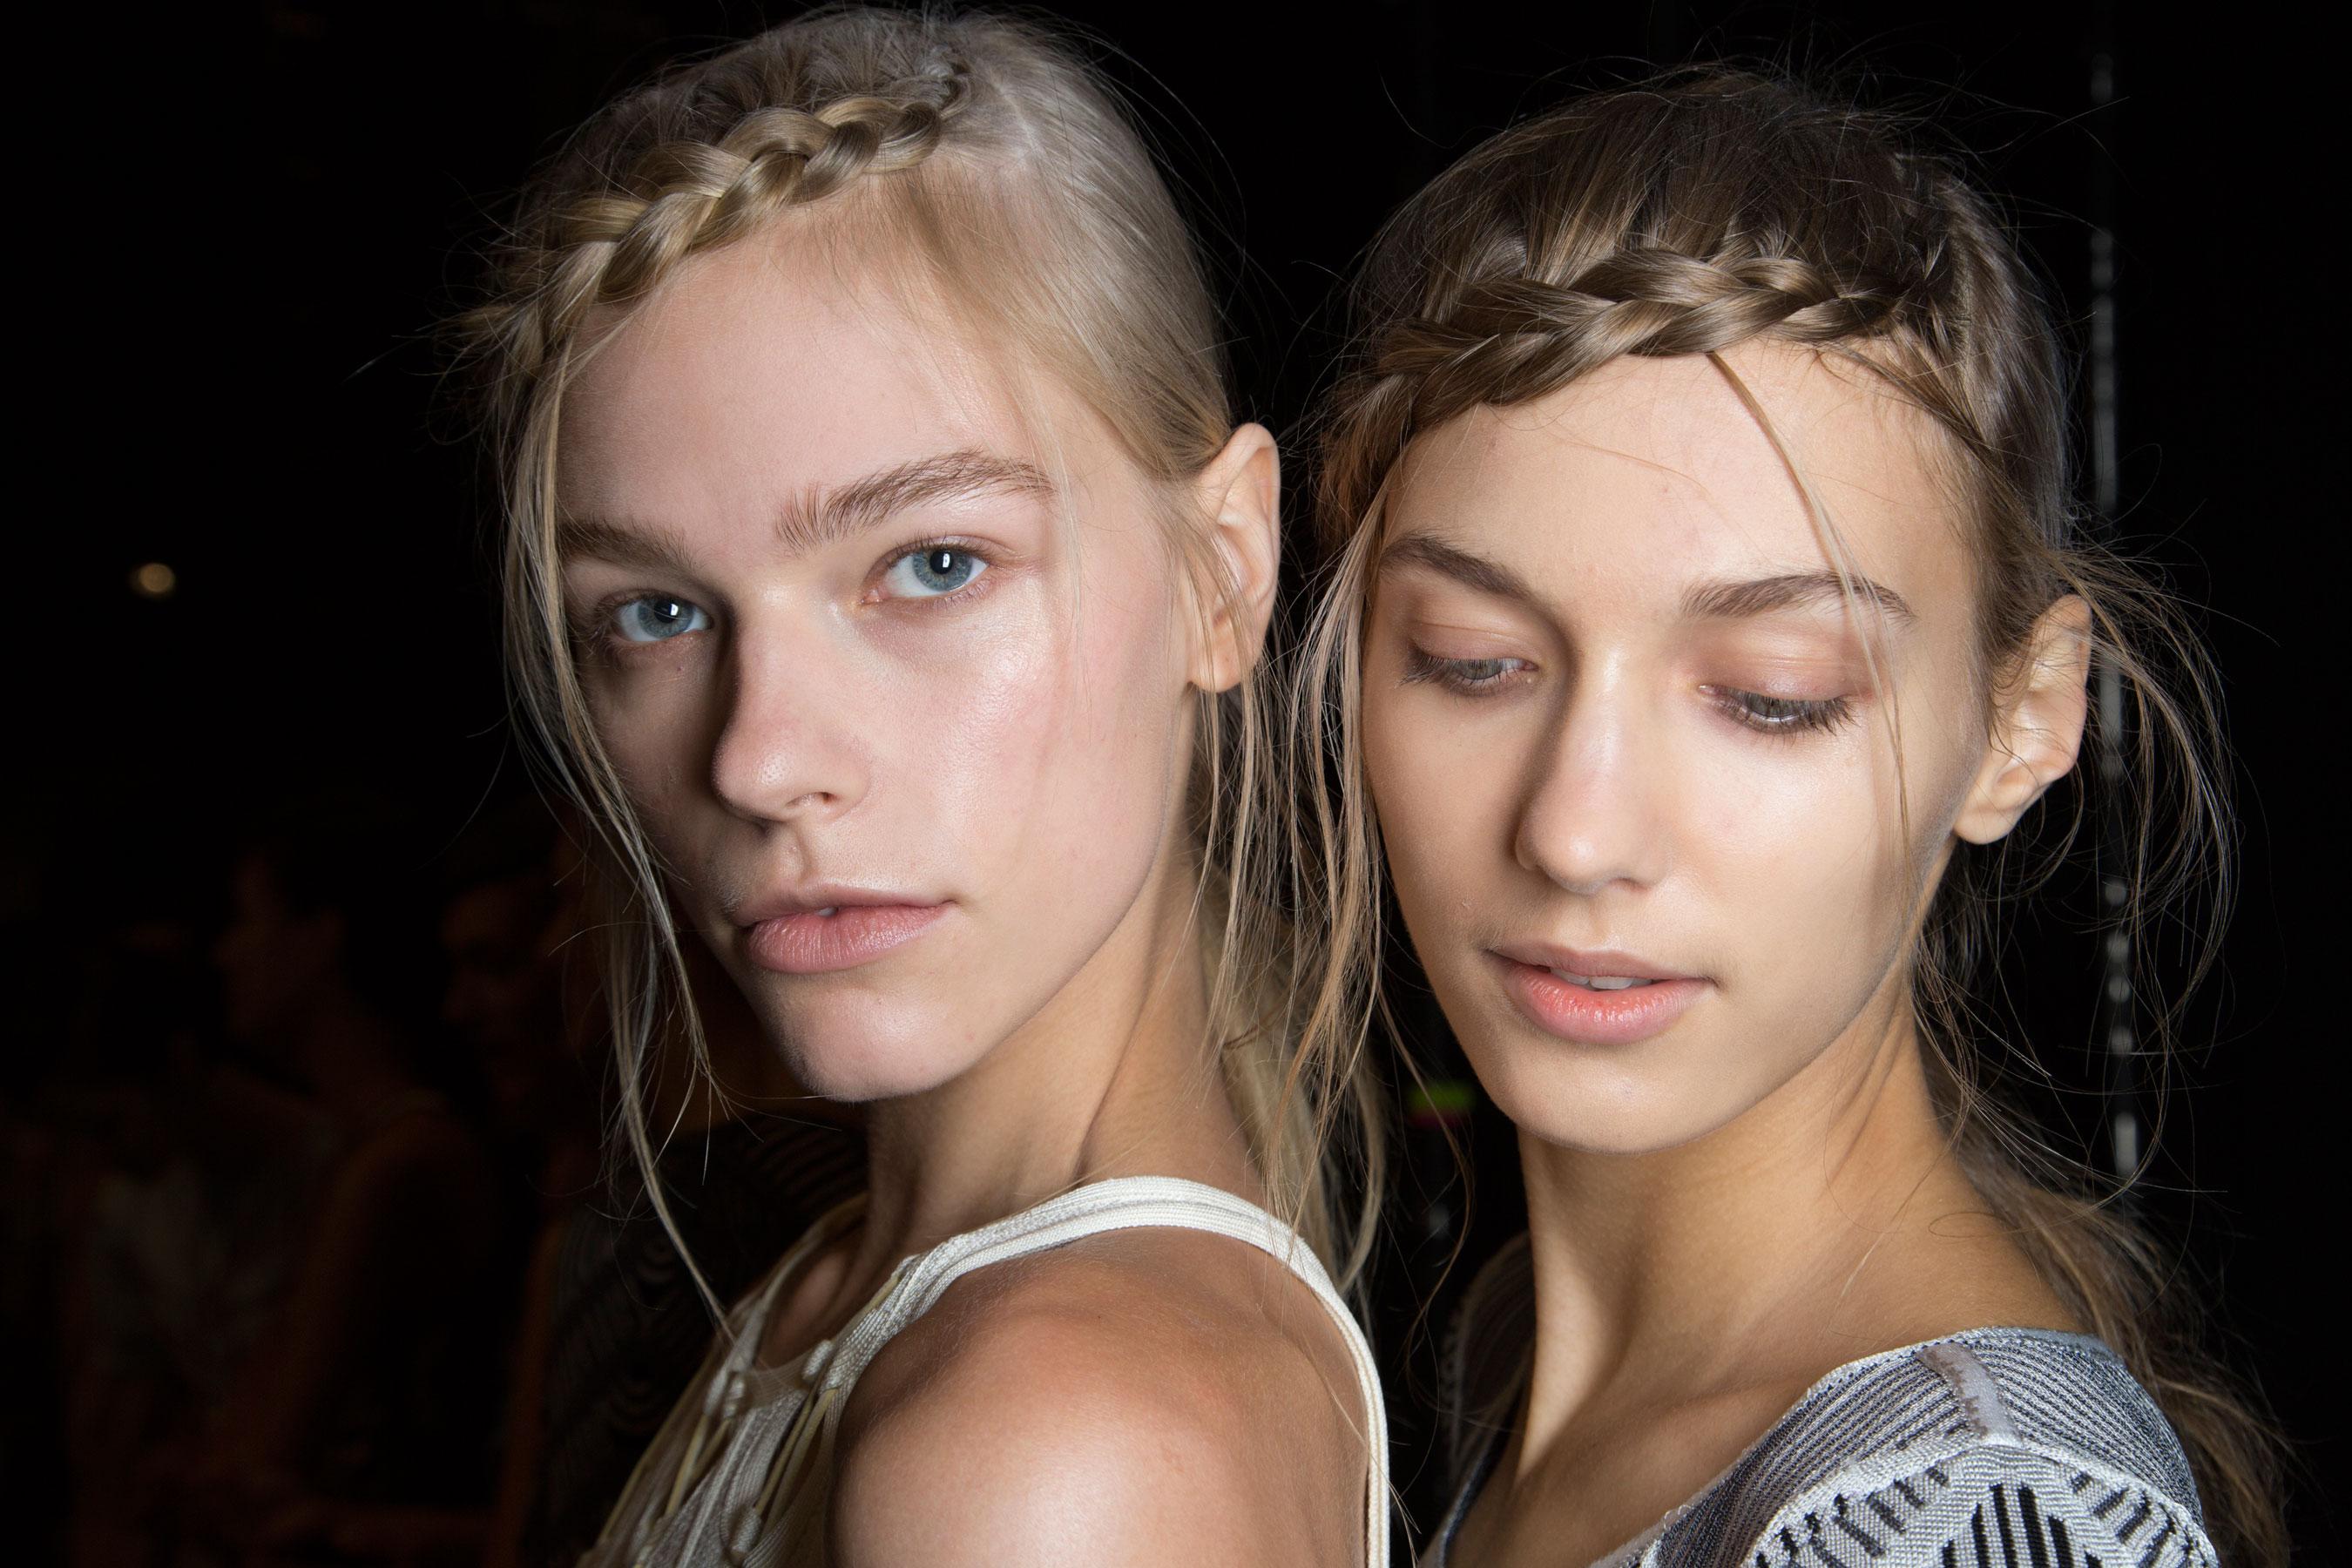 Herve-Leger-backstage-beauty-spring-2016-fashion-show-the-impression-78